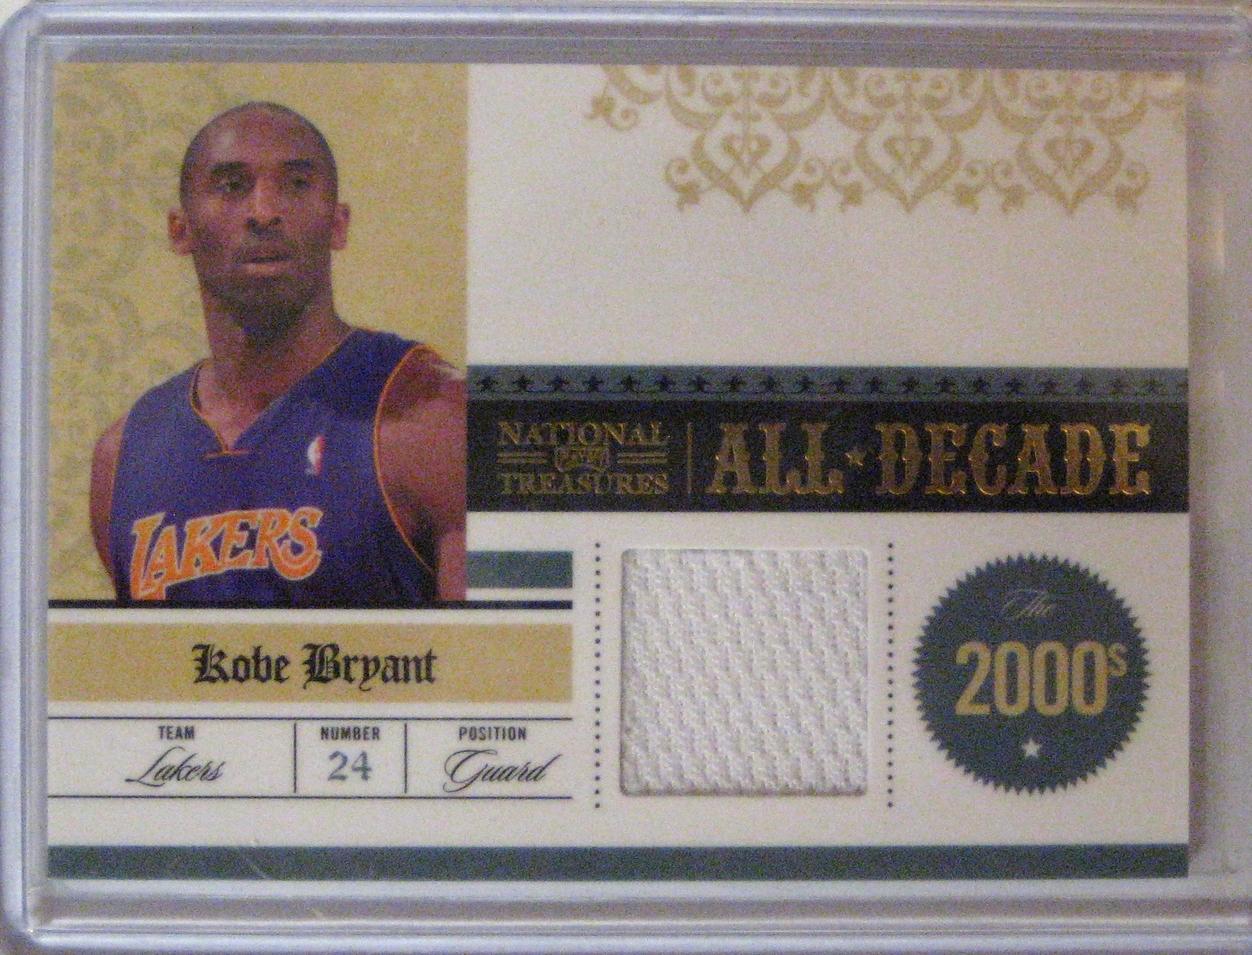 2009-10 Playoff National Treasures All Decade Materials Kobe Bryant #/99